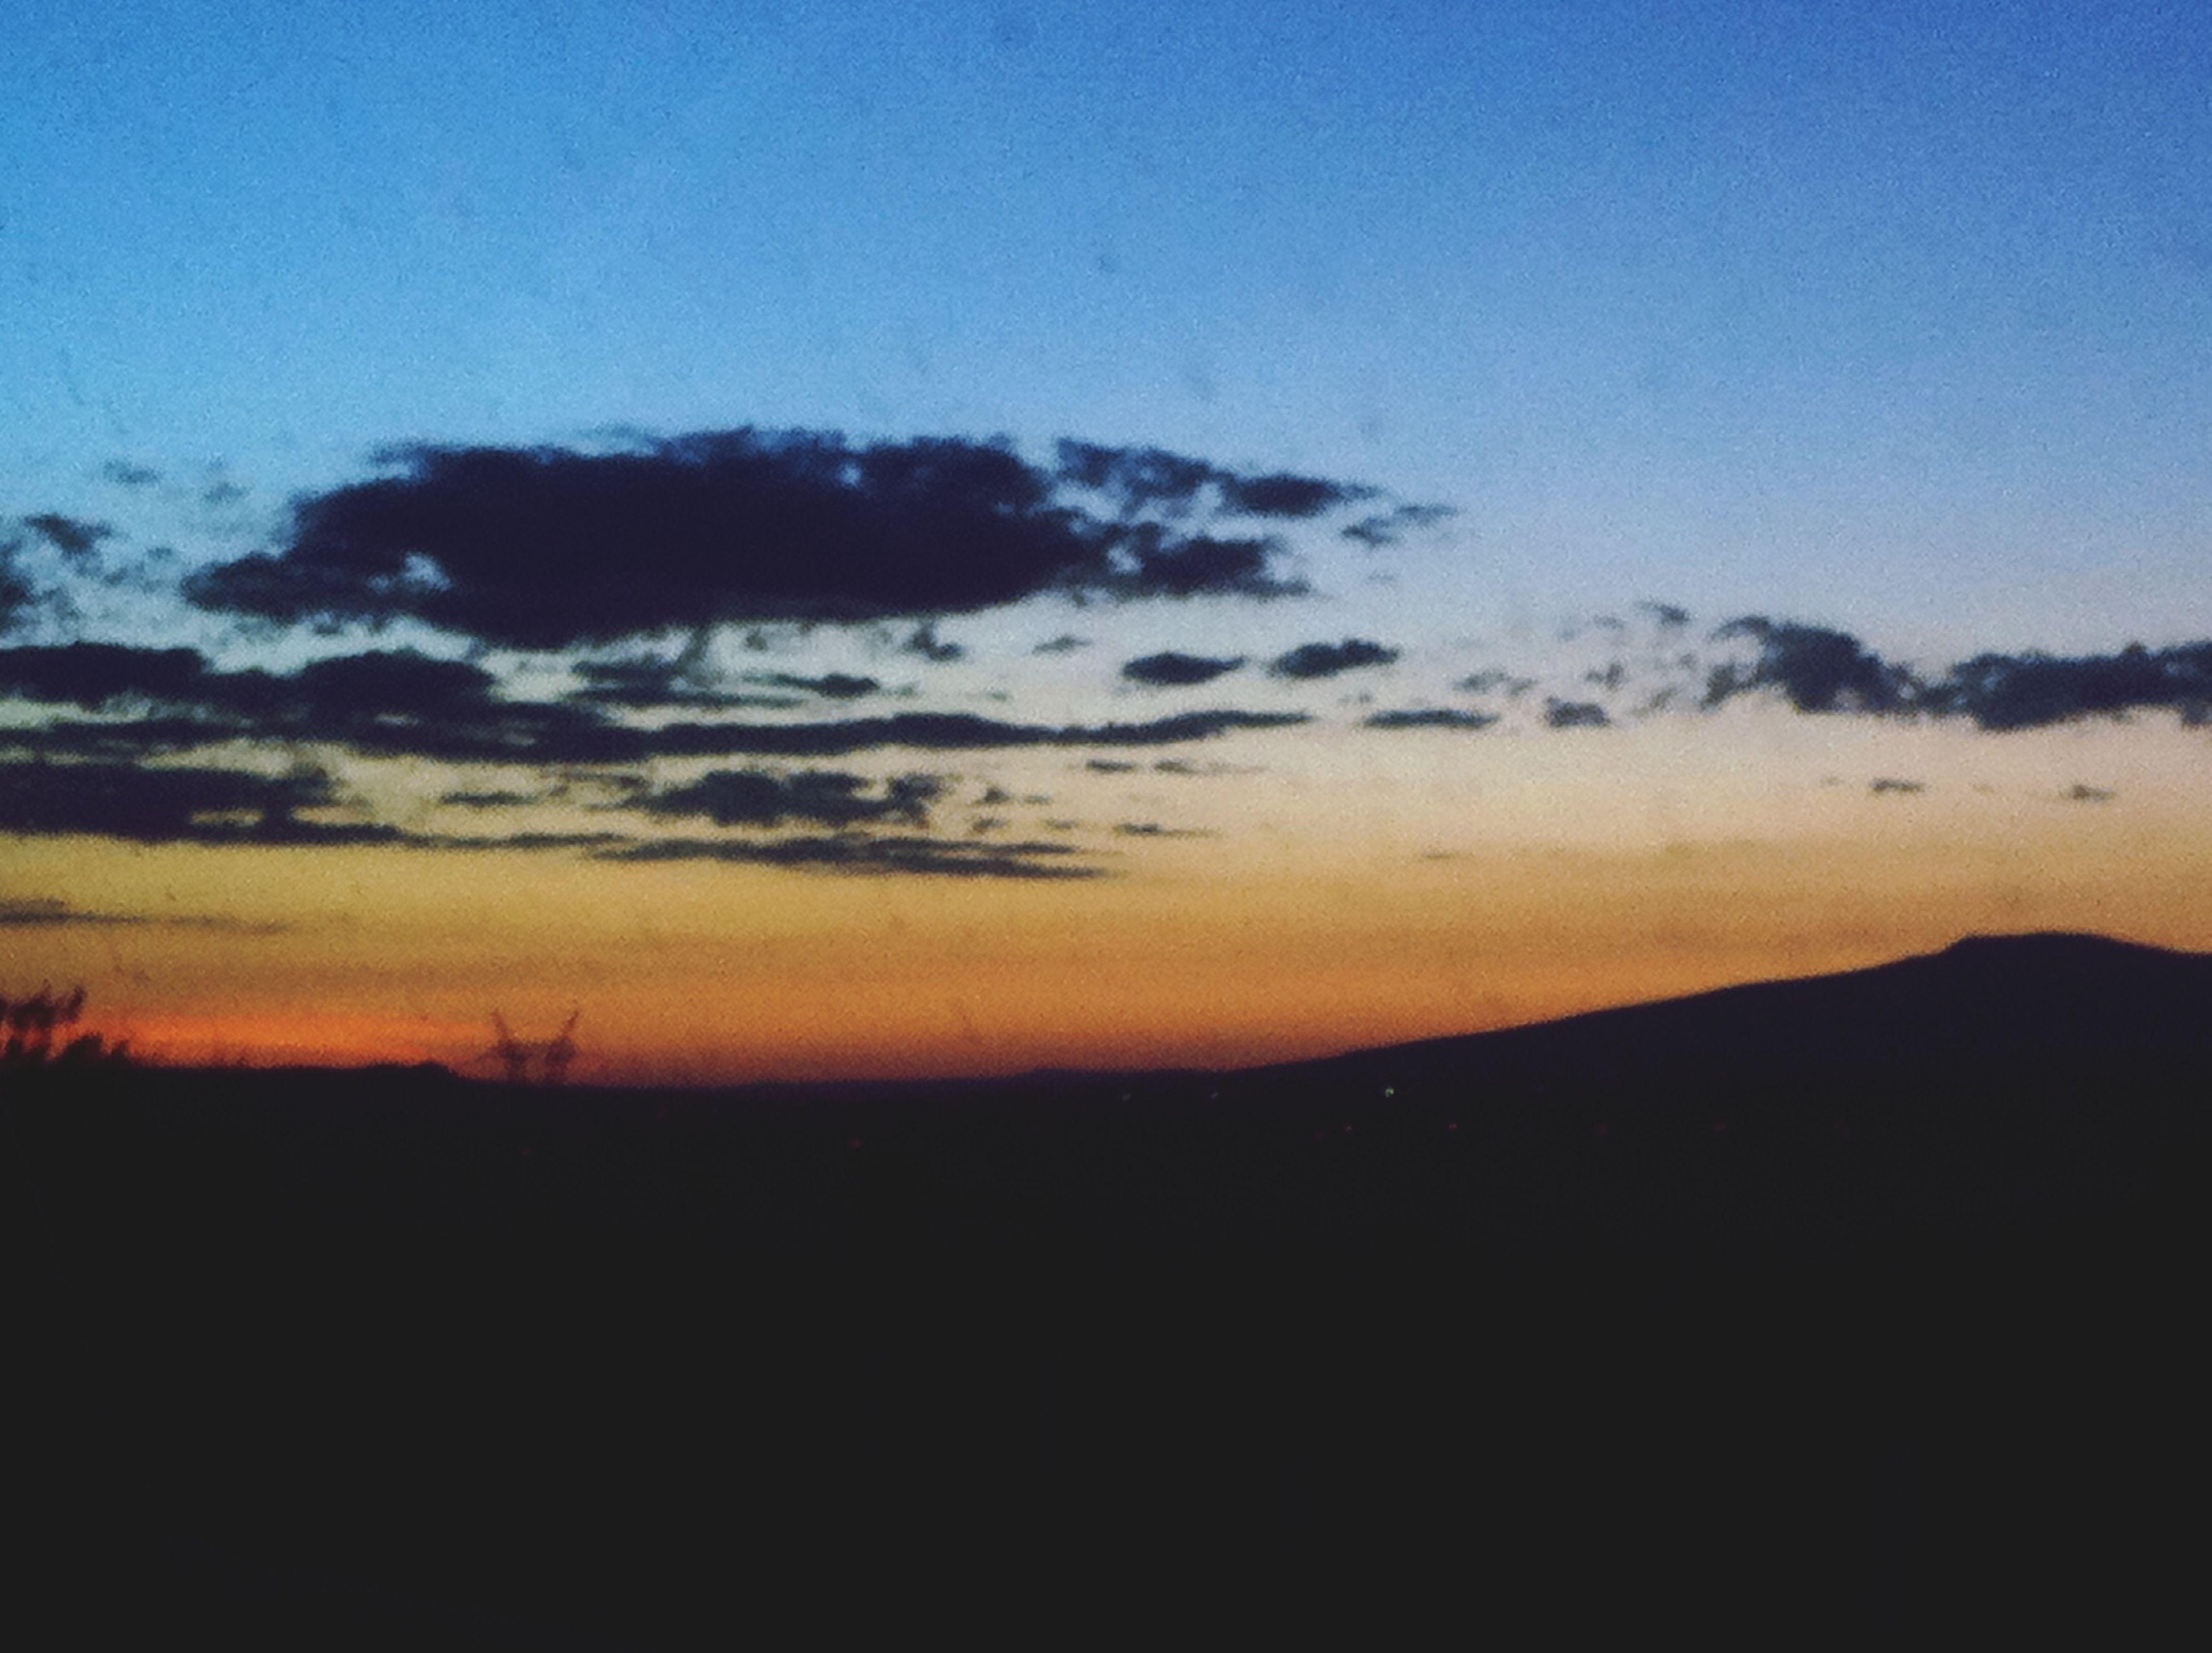 sunset, scenics, tranquil scene, silhouette, tranquility, beauty in nature, landscape, copy space, sky, nature, idyllic, mountain, dusk, blue, orange color, non-urban scene, outdoors, remote, dark, horizon over land